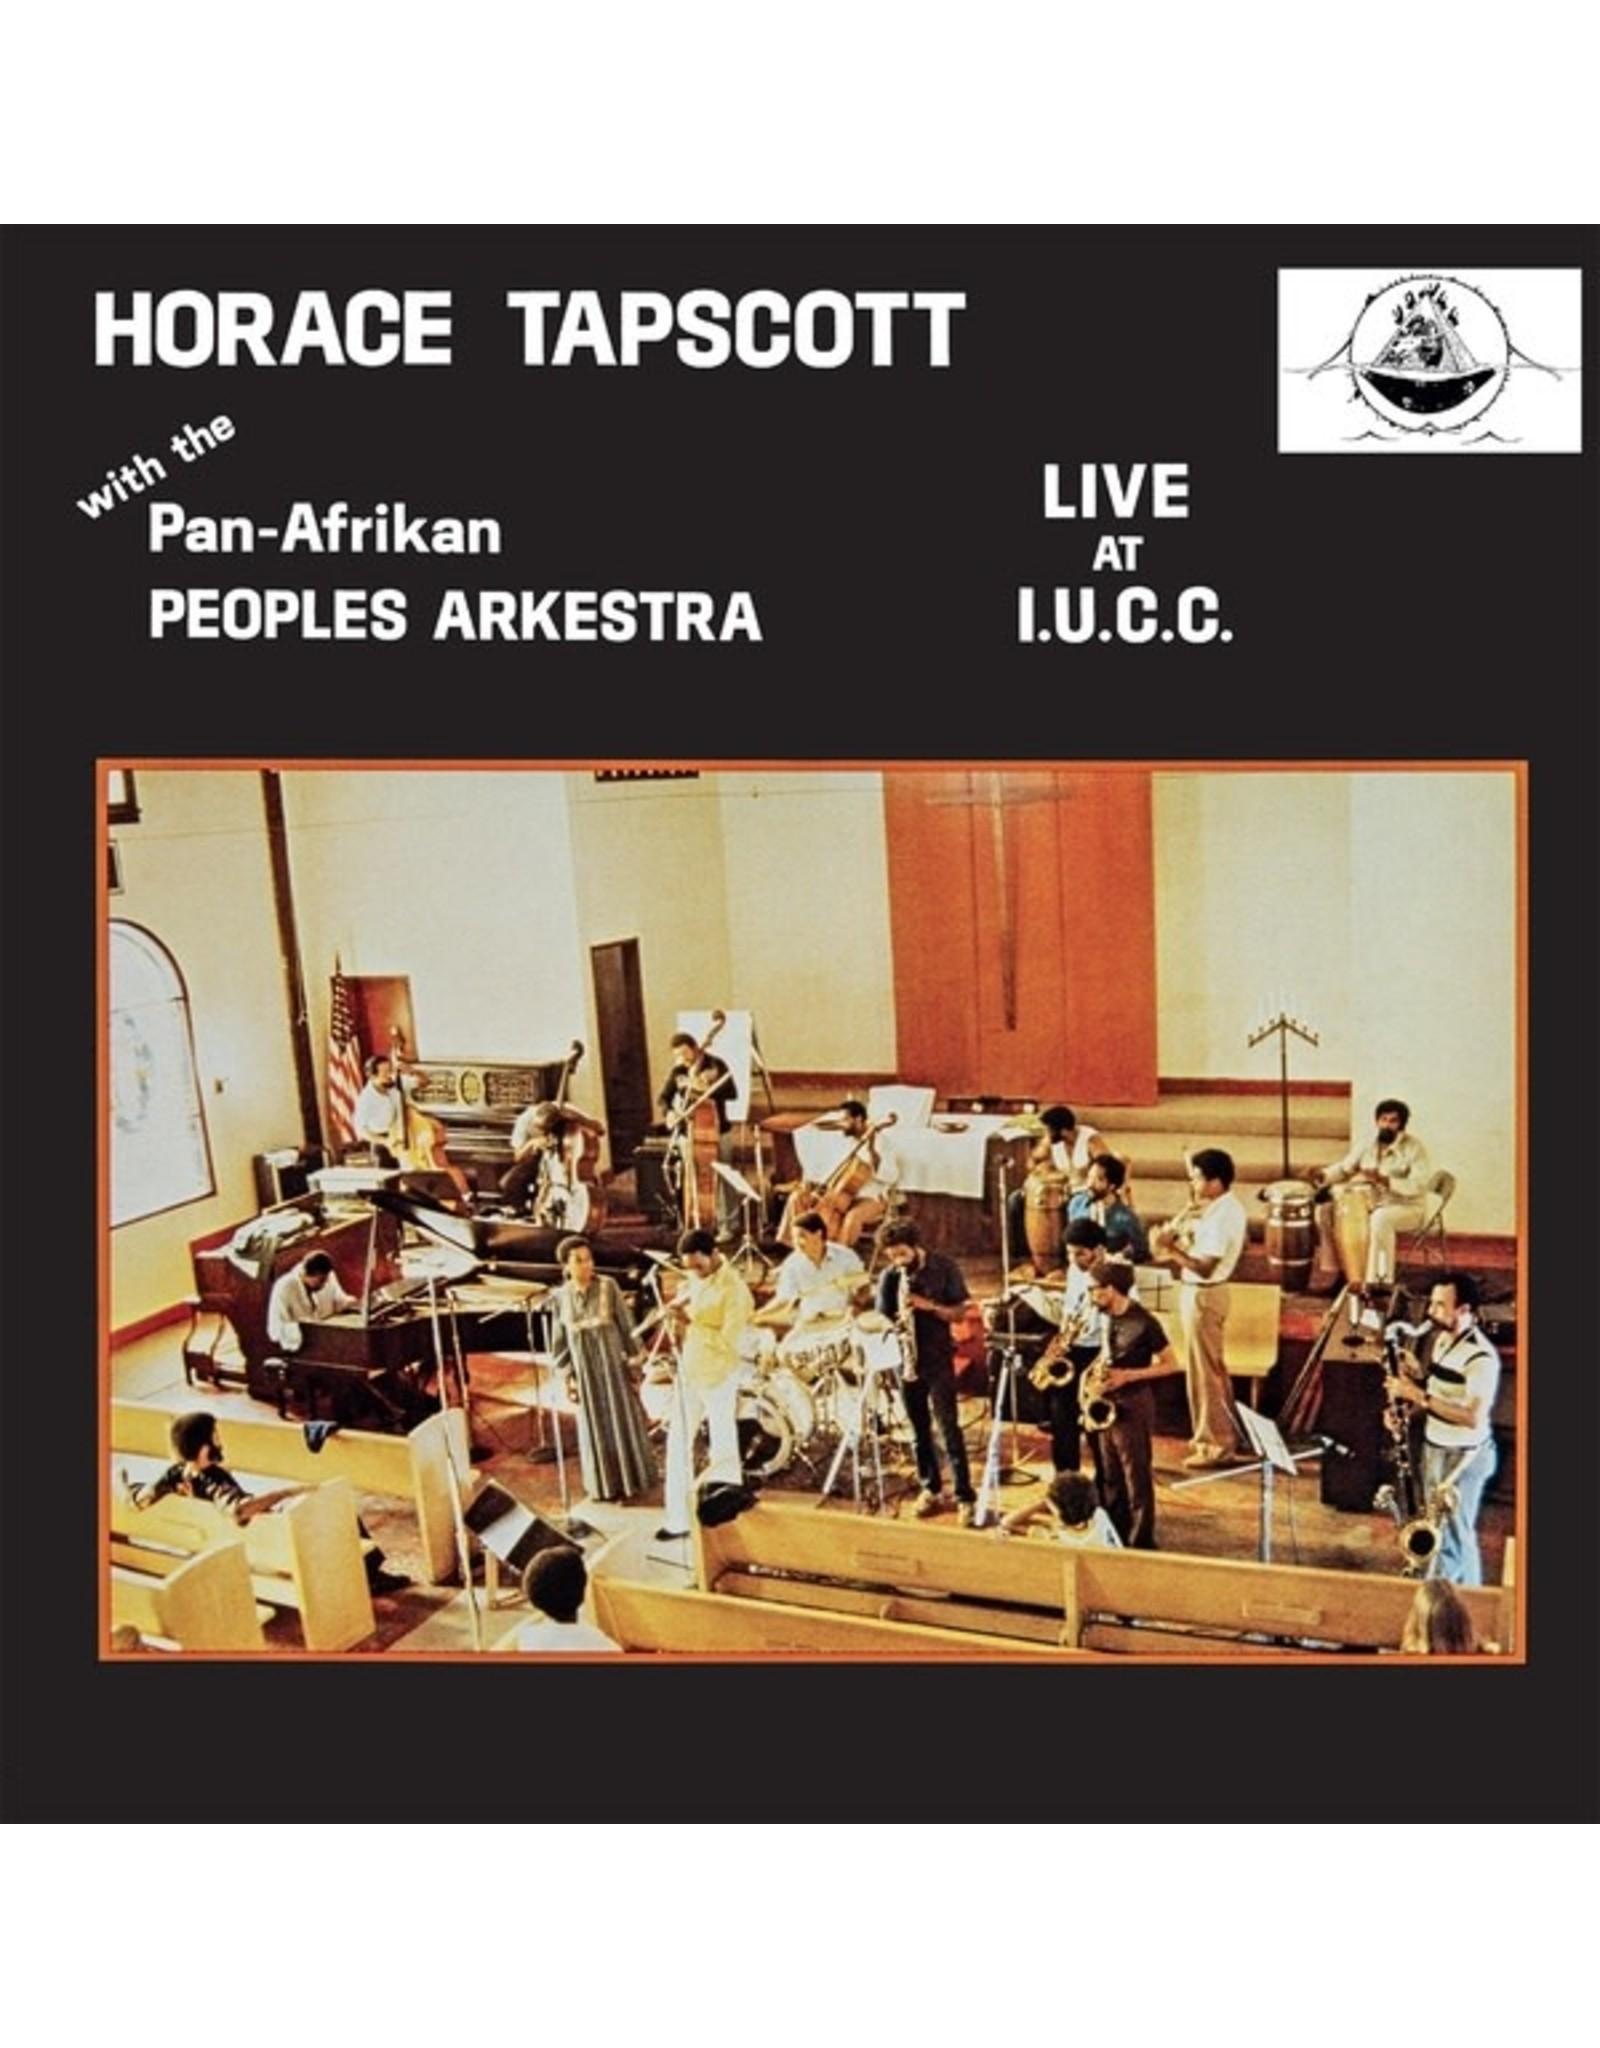 Outernational Tapscott, Horace/Pan-Afrikan Peoples Arkestra: Live at I.U.C.C.  LP